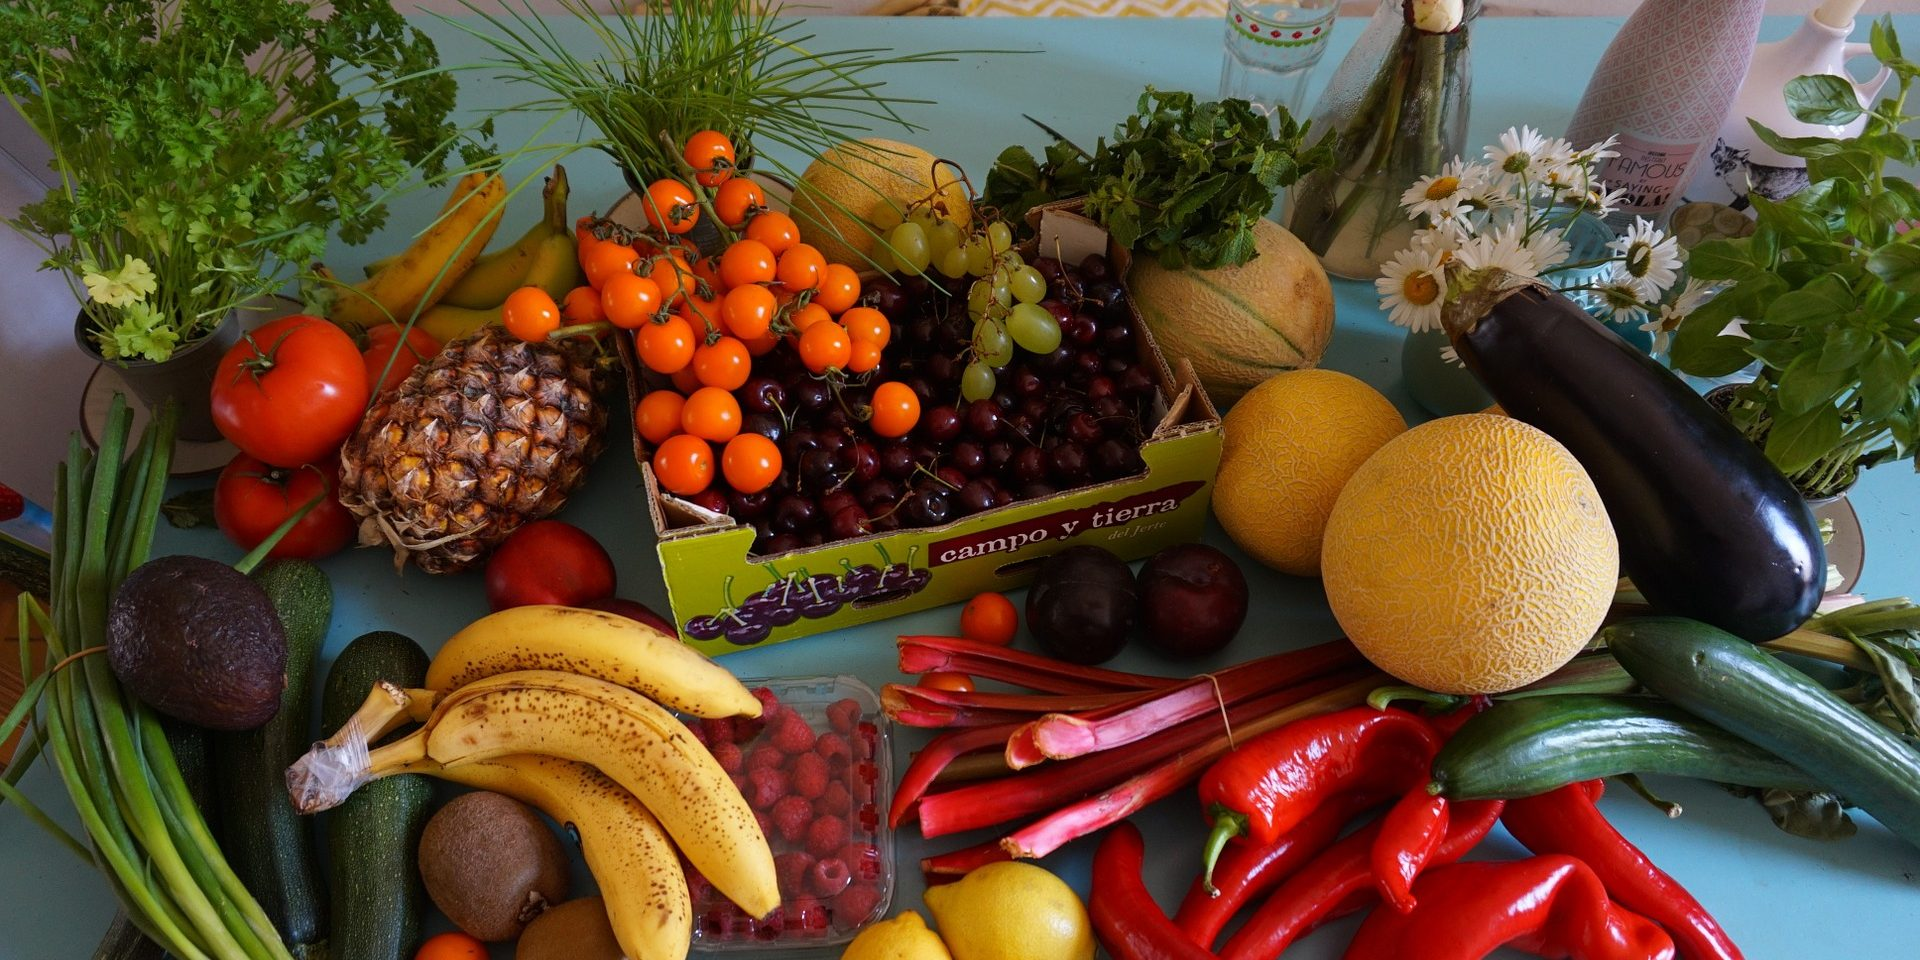 groceries-1343147_1920